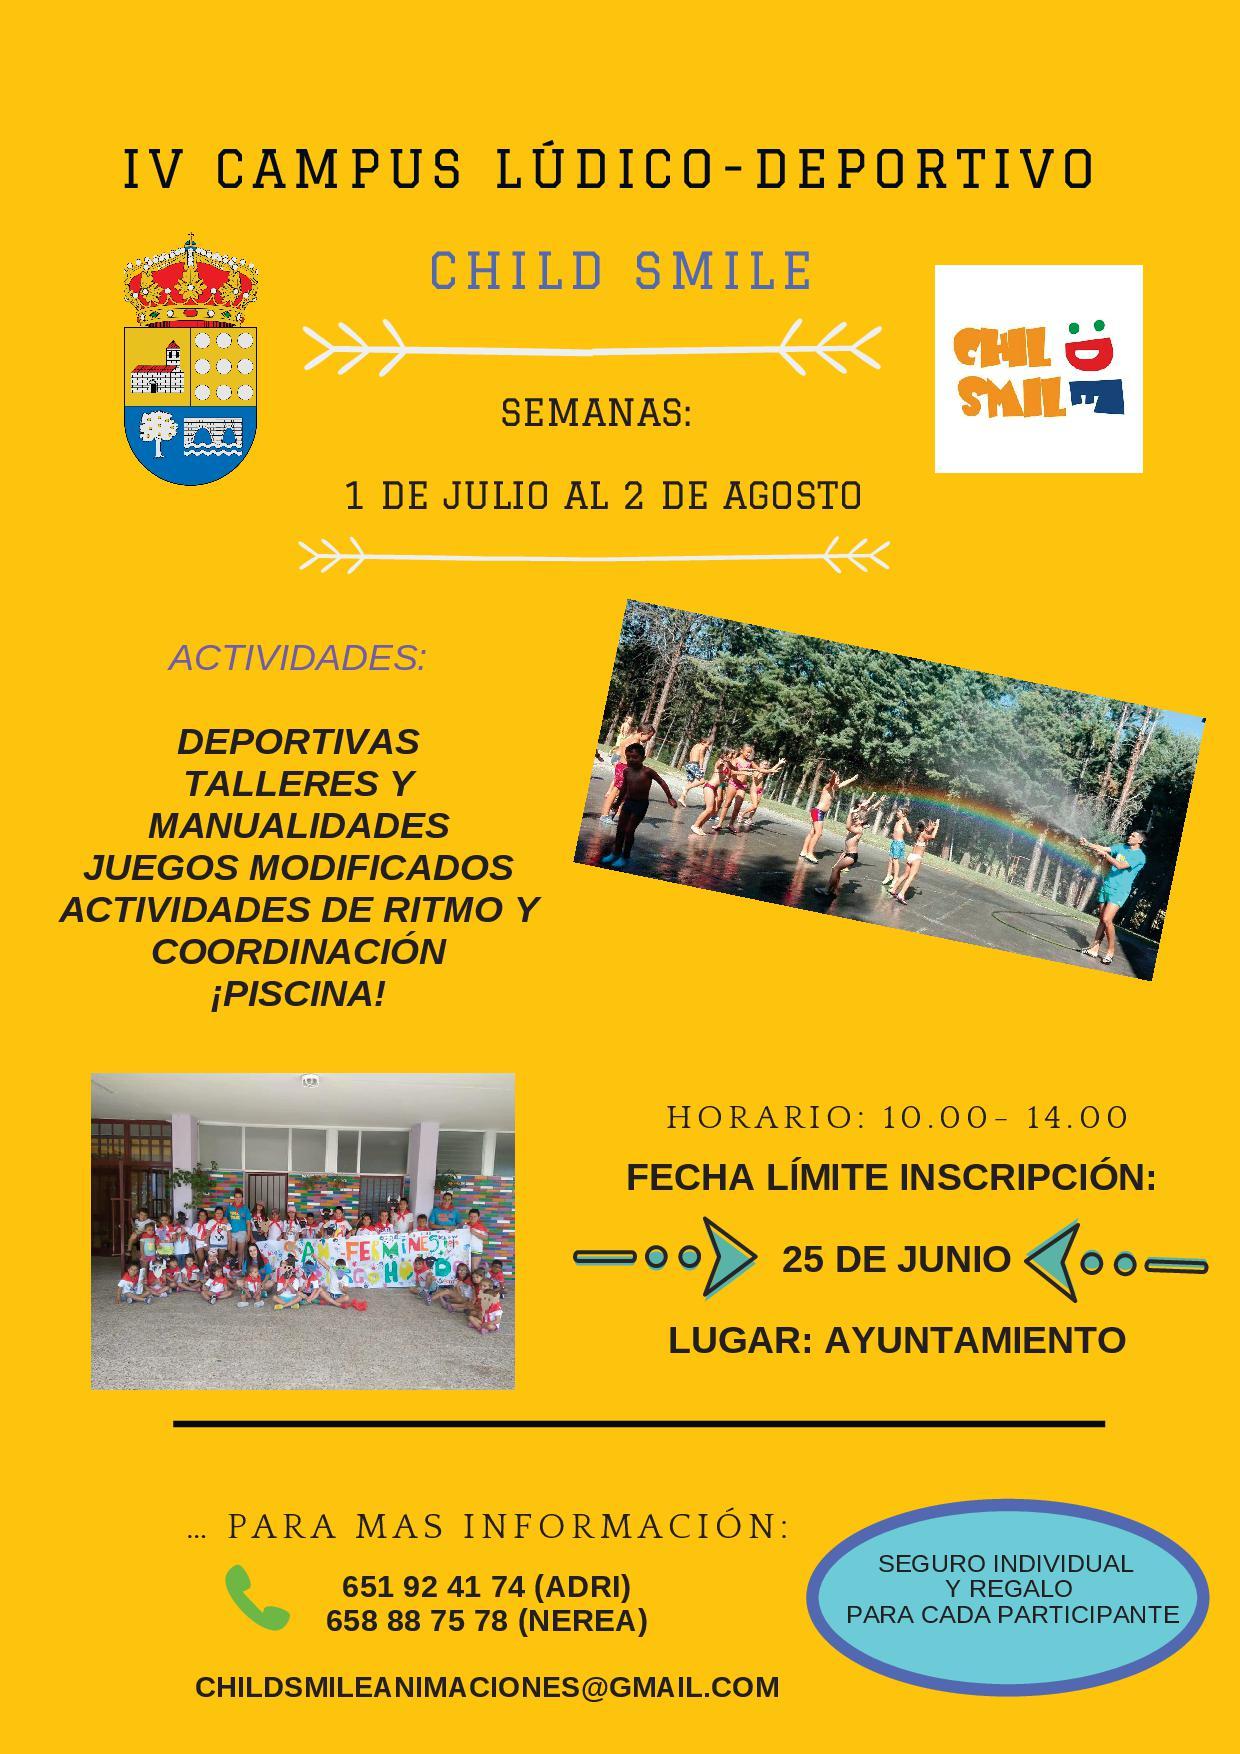 CAMPUS LÚDICO-DEPORTIVO CHILD SMILE 2019